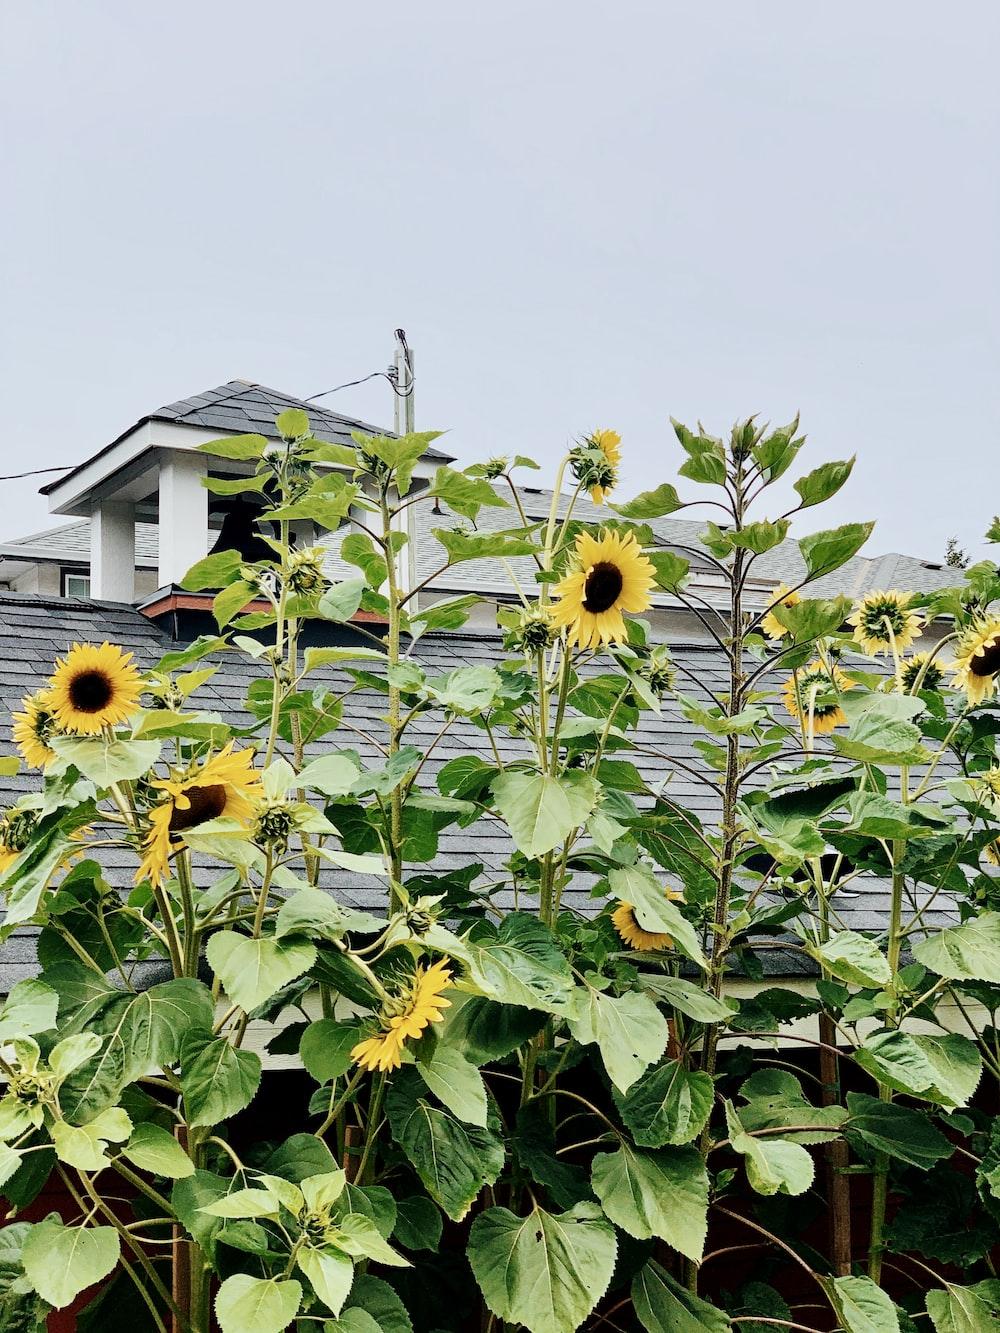 blooming yellow sunflower near house